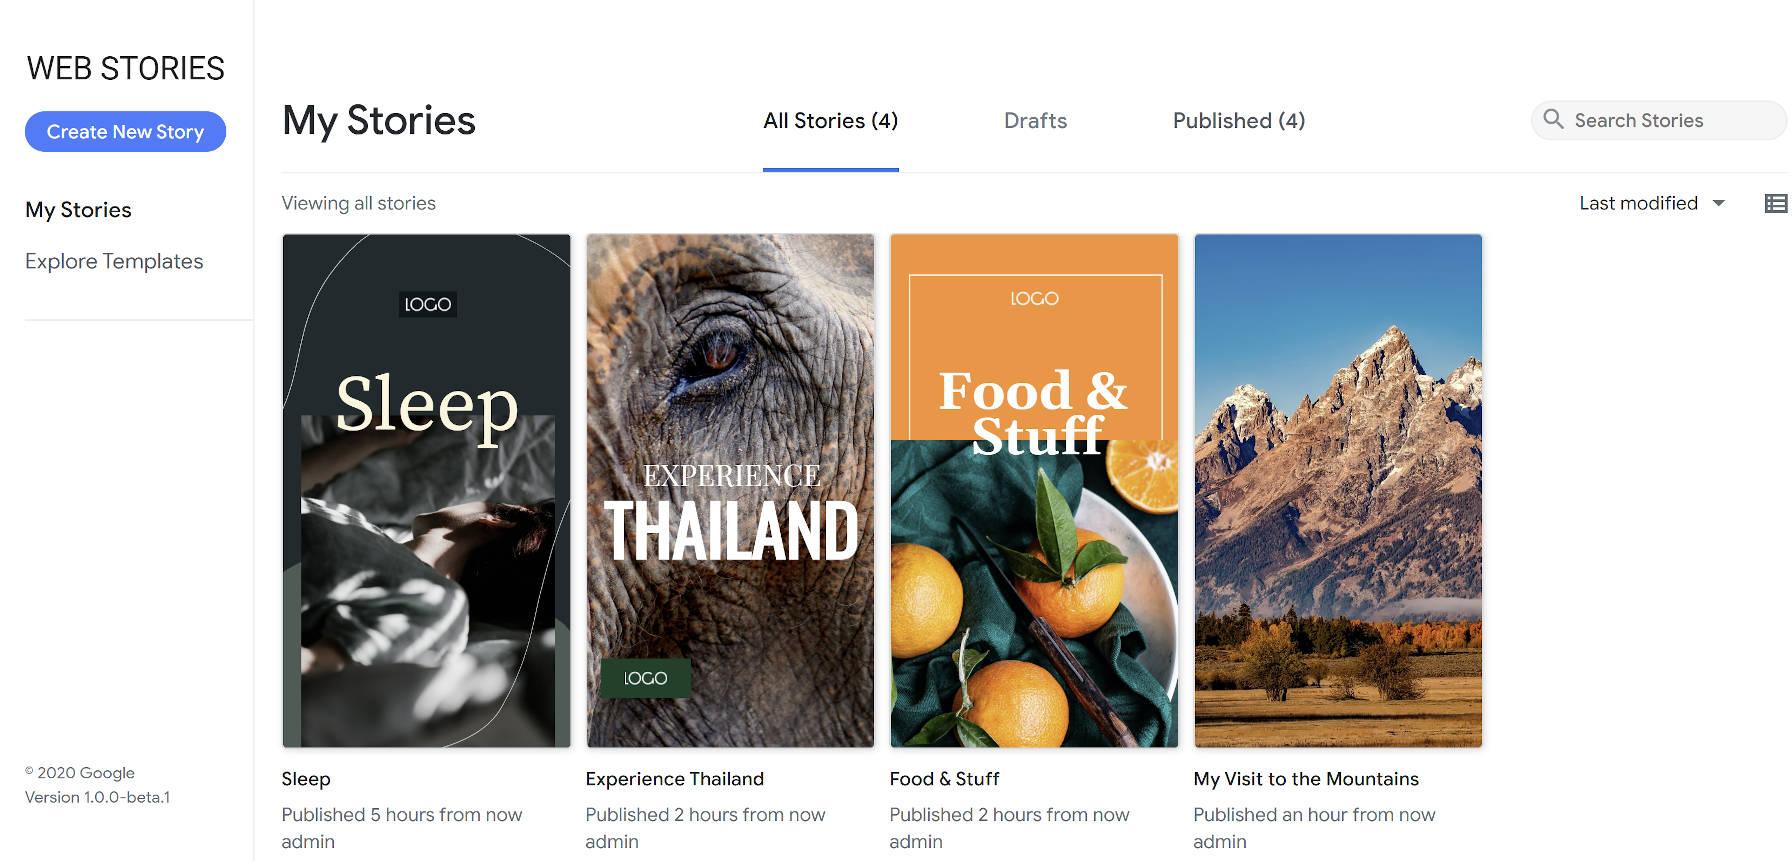 google-lanchches-amp-powered-web-stories-beta-of-wordpress-1的Google发布针对WordPress的AMP-powered Web Stories插件的Beta